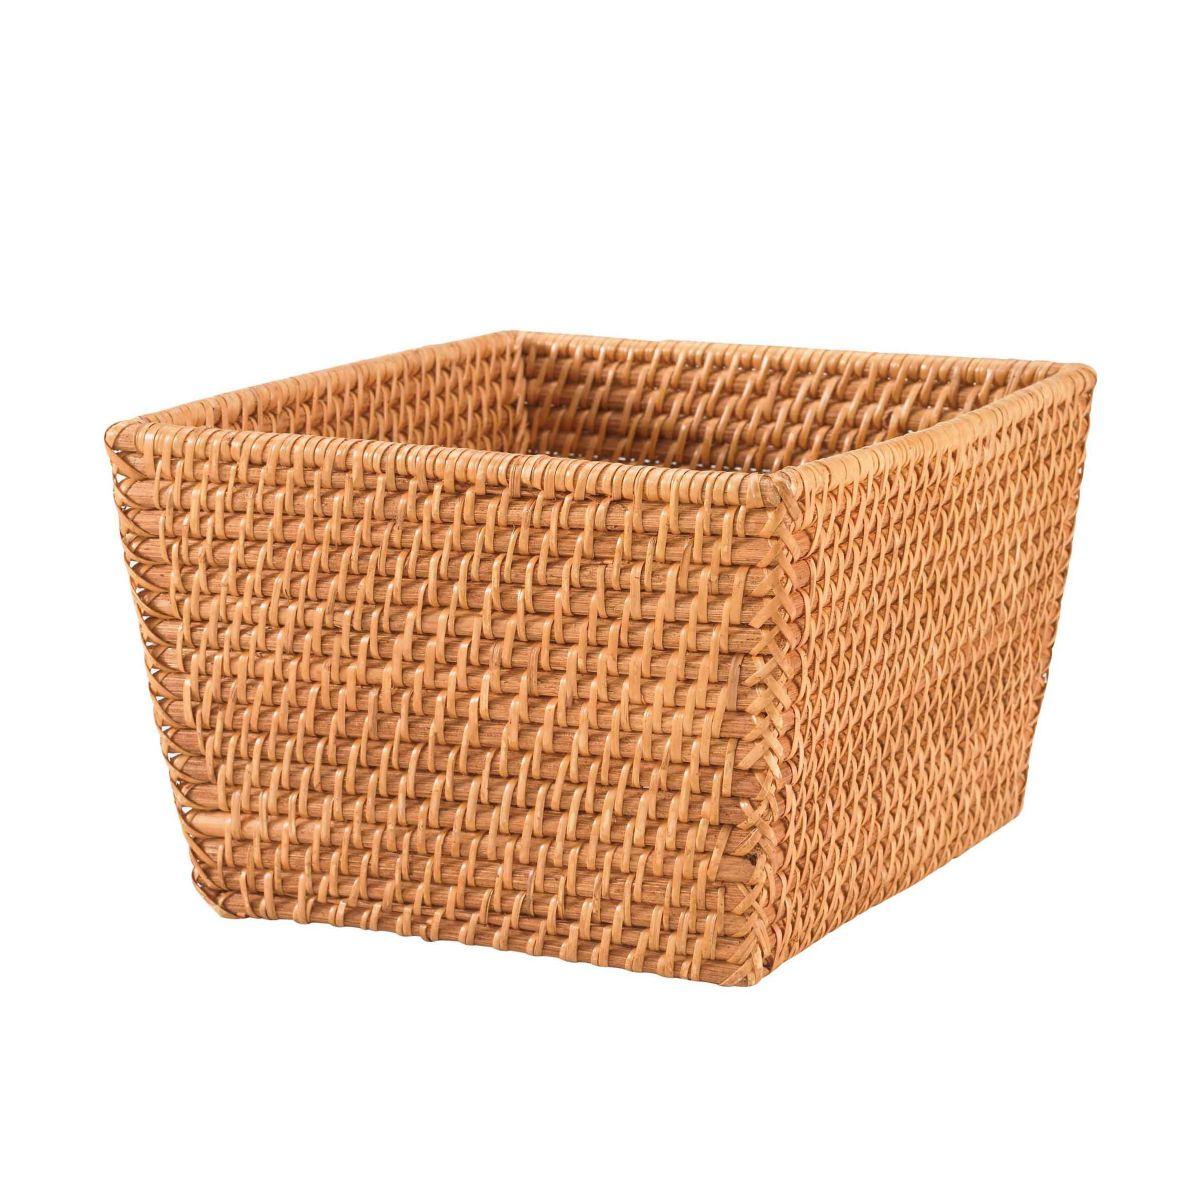 Cube Basket # DK23